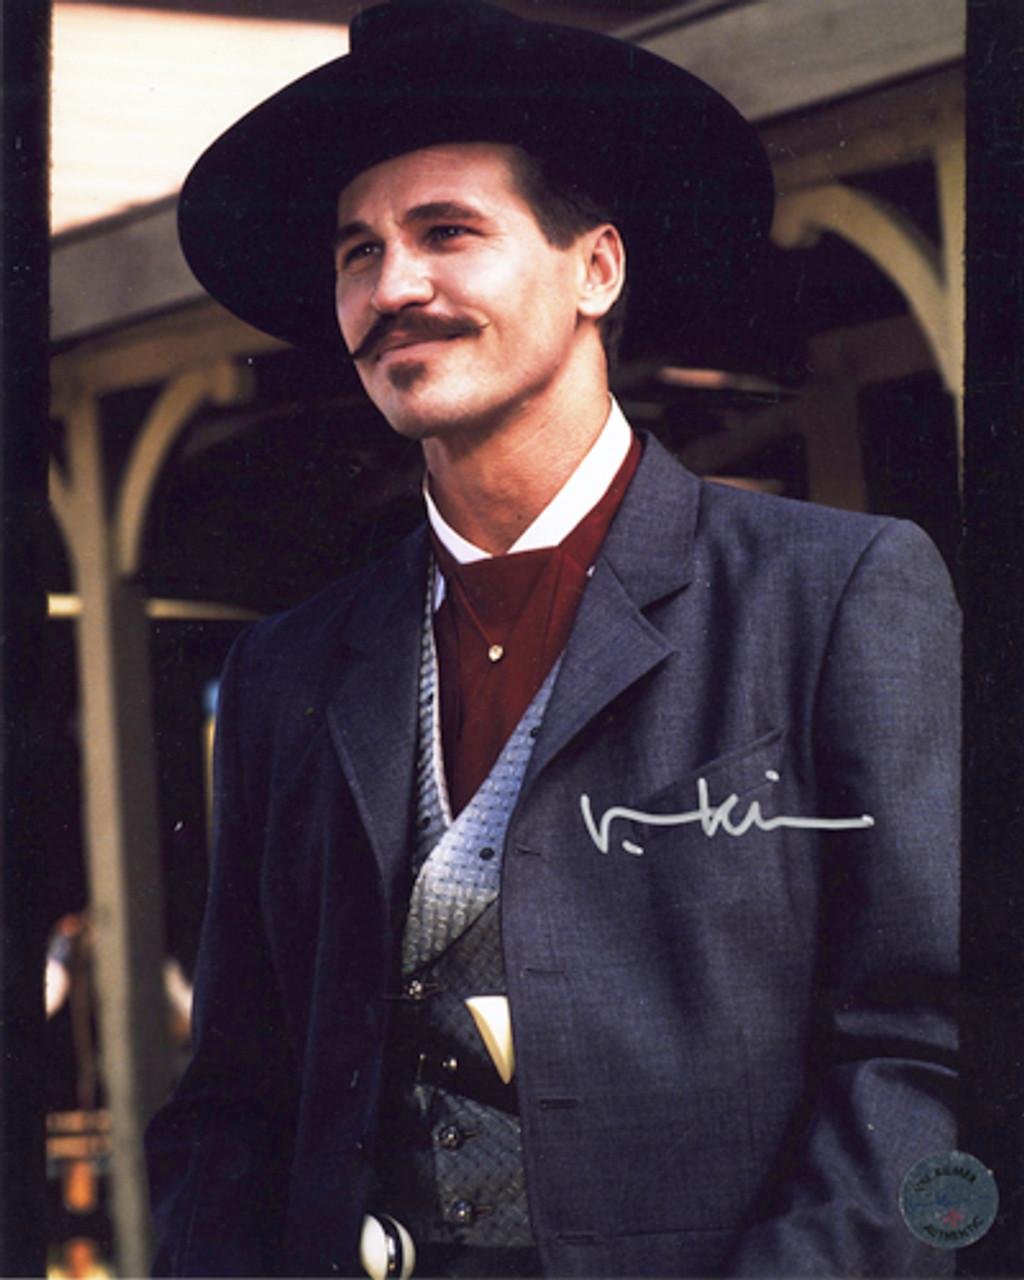 doc holliday autographed photo 2 val kilmer